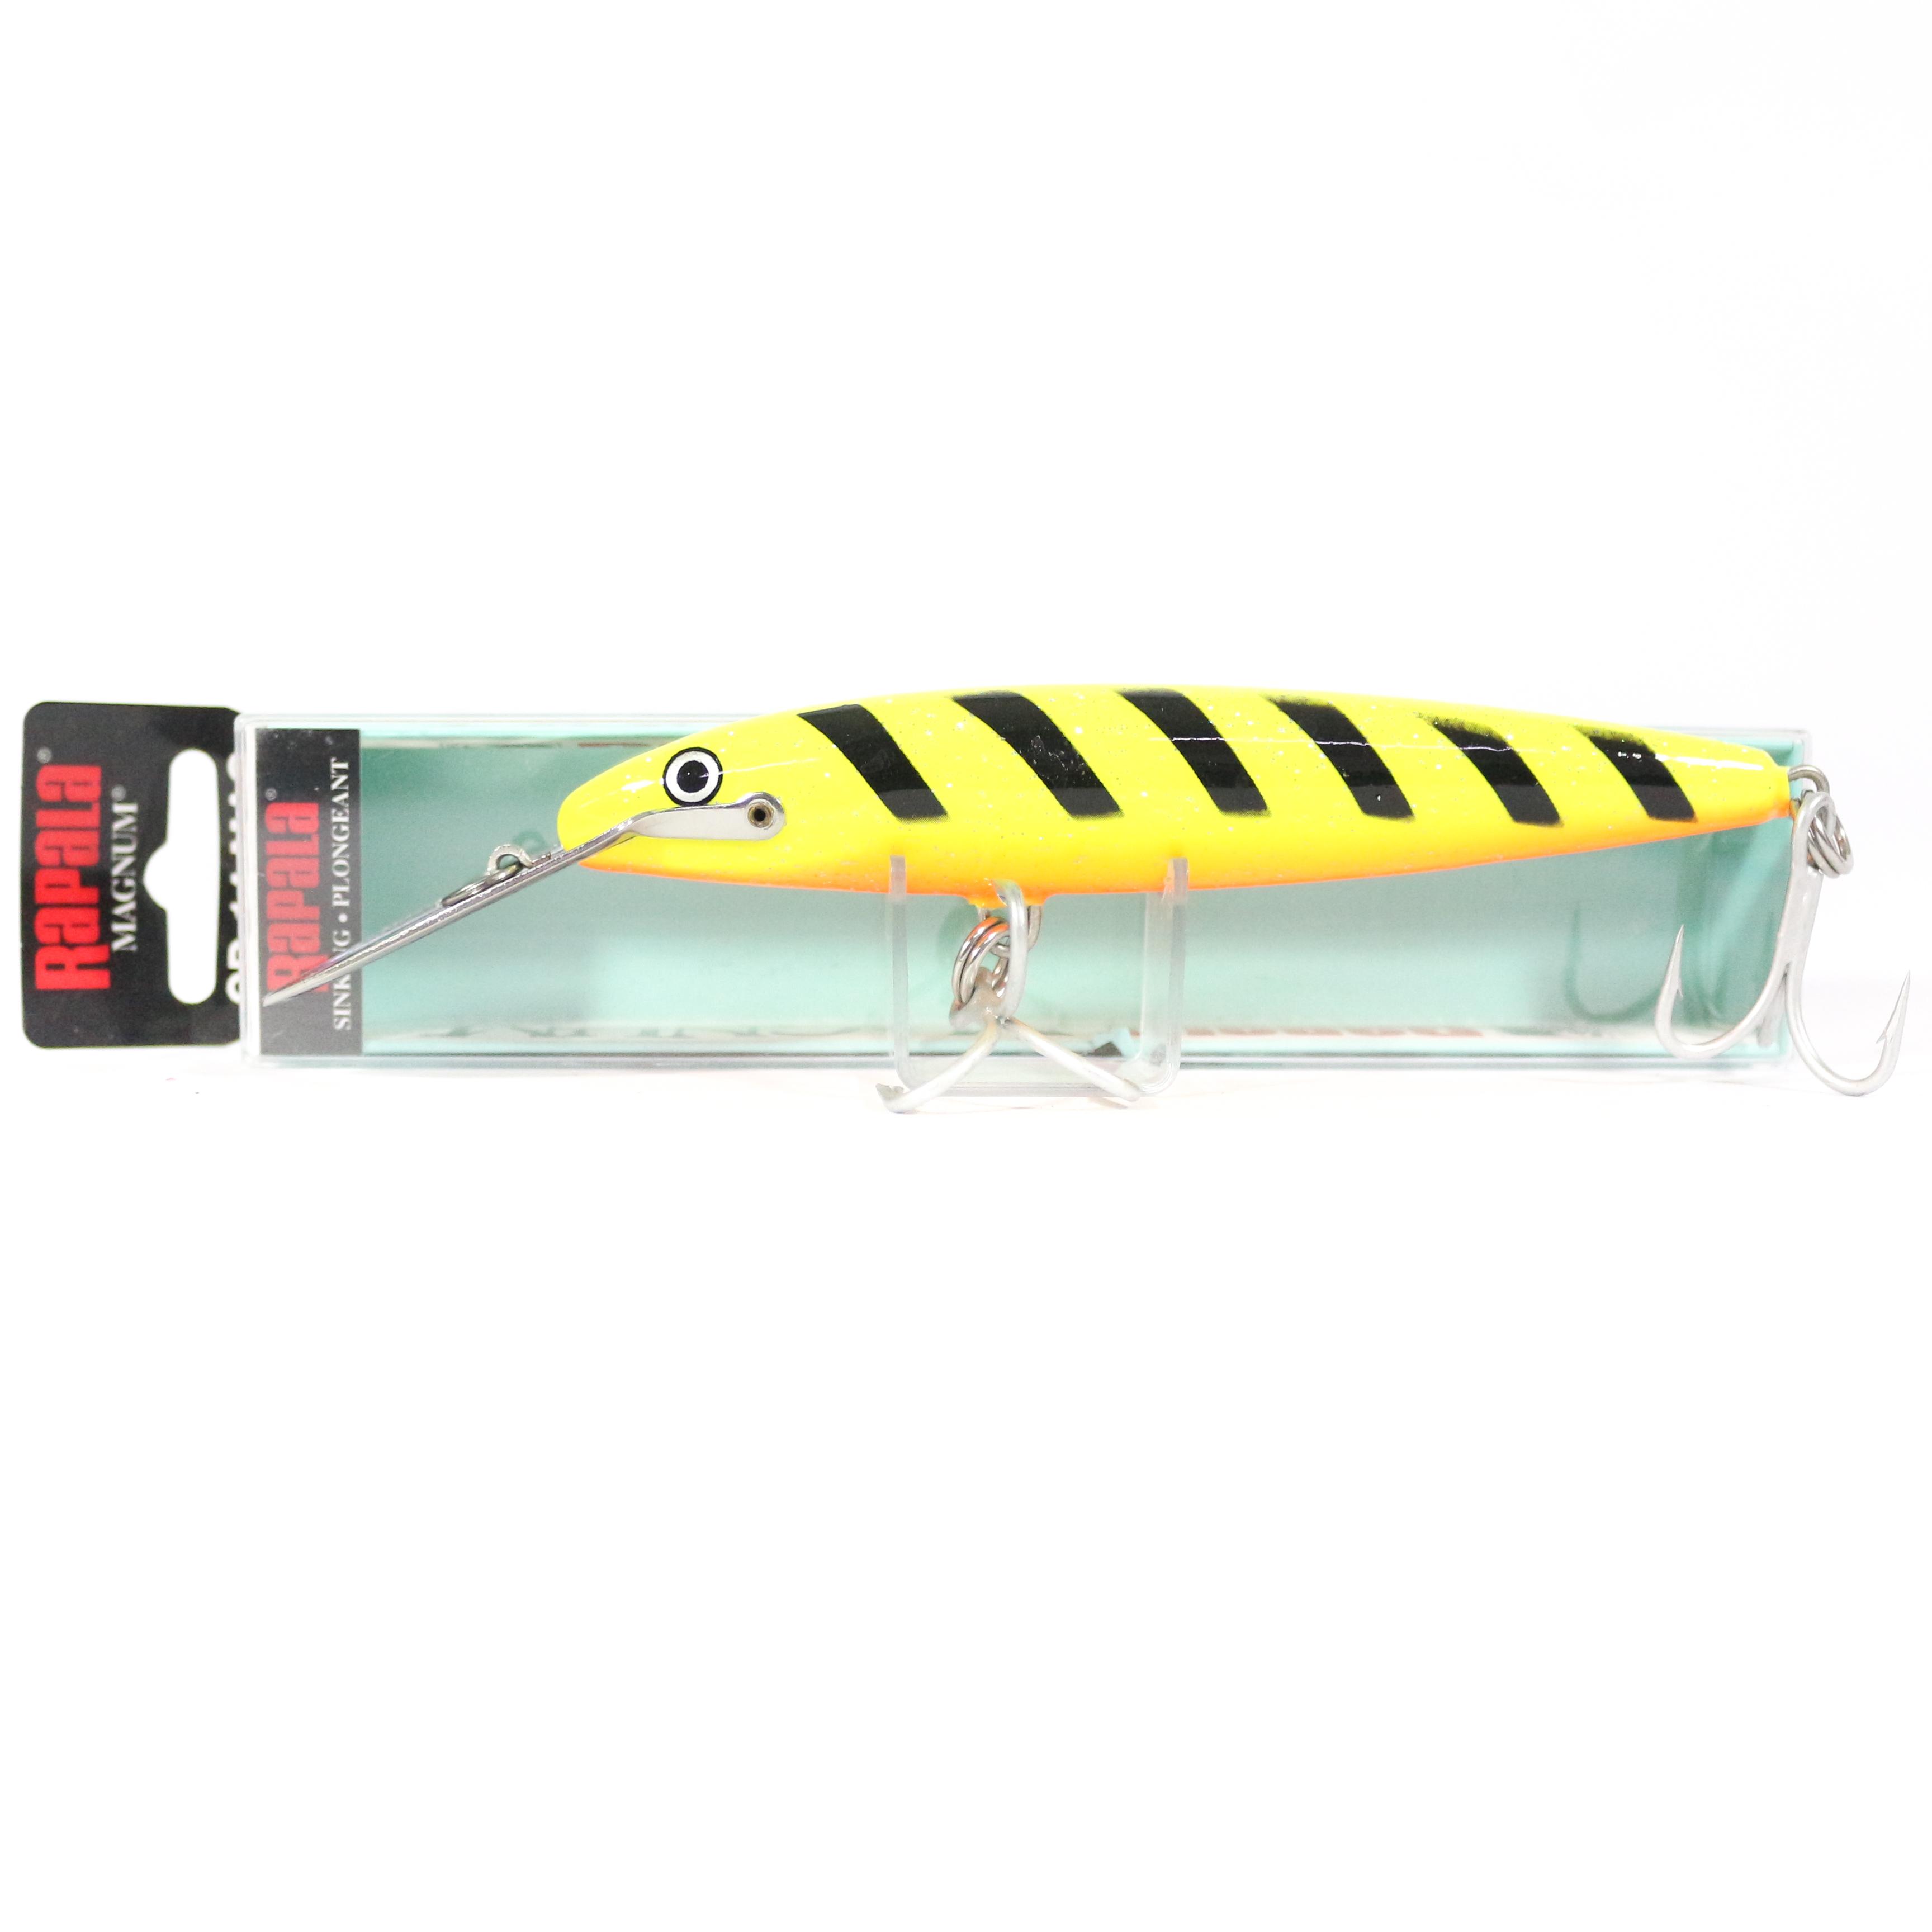 Rapala CD Magnum Sinking Lure CDMAG14/COSK (2256)